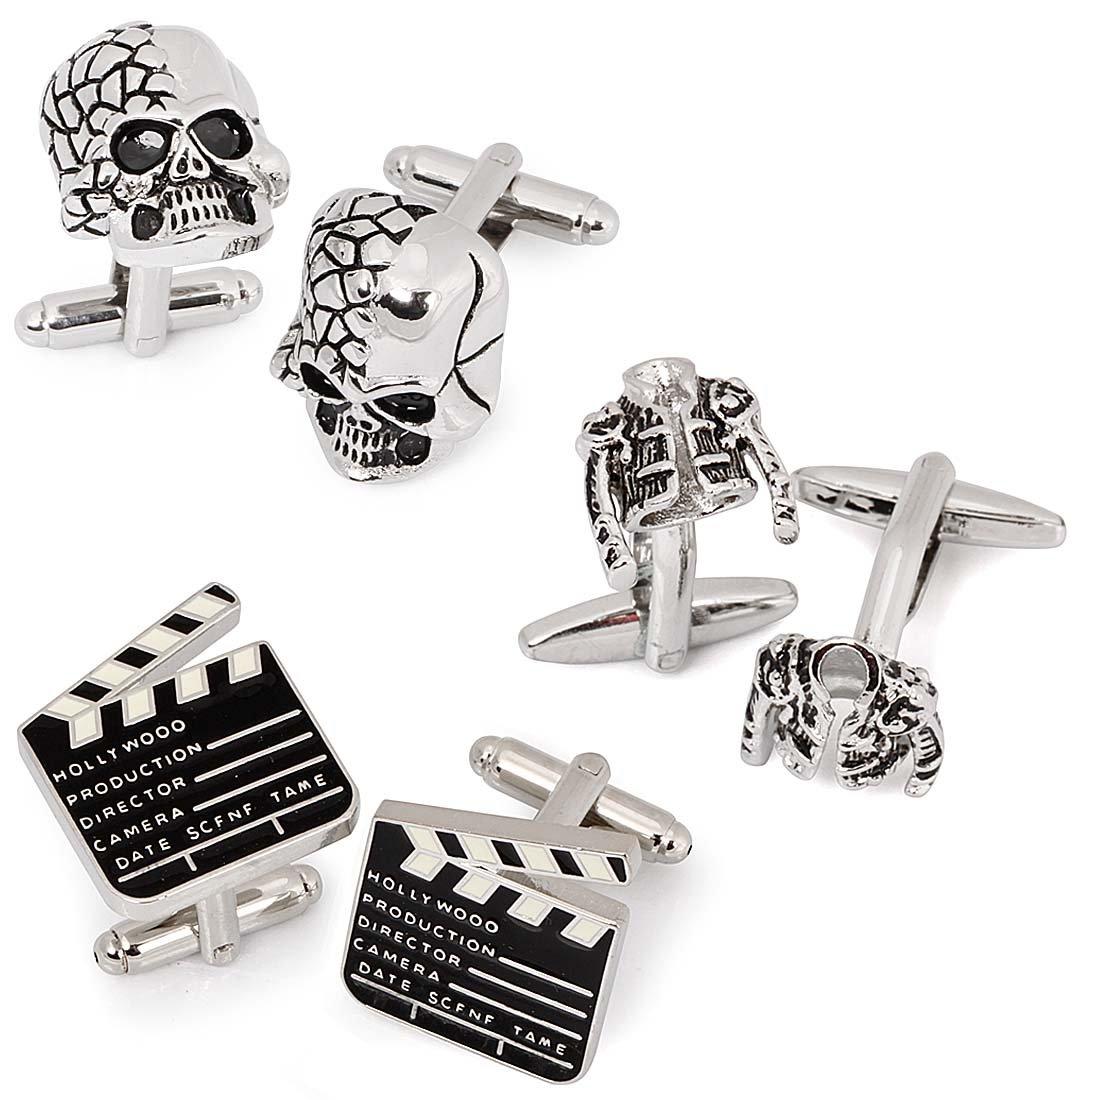 BMC 3 Pair Trendy Silver Colored Mens Cufflinks Set - Pop Star Jackets Skulls Movie Markers by b.m.c (Image #2)